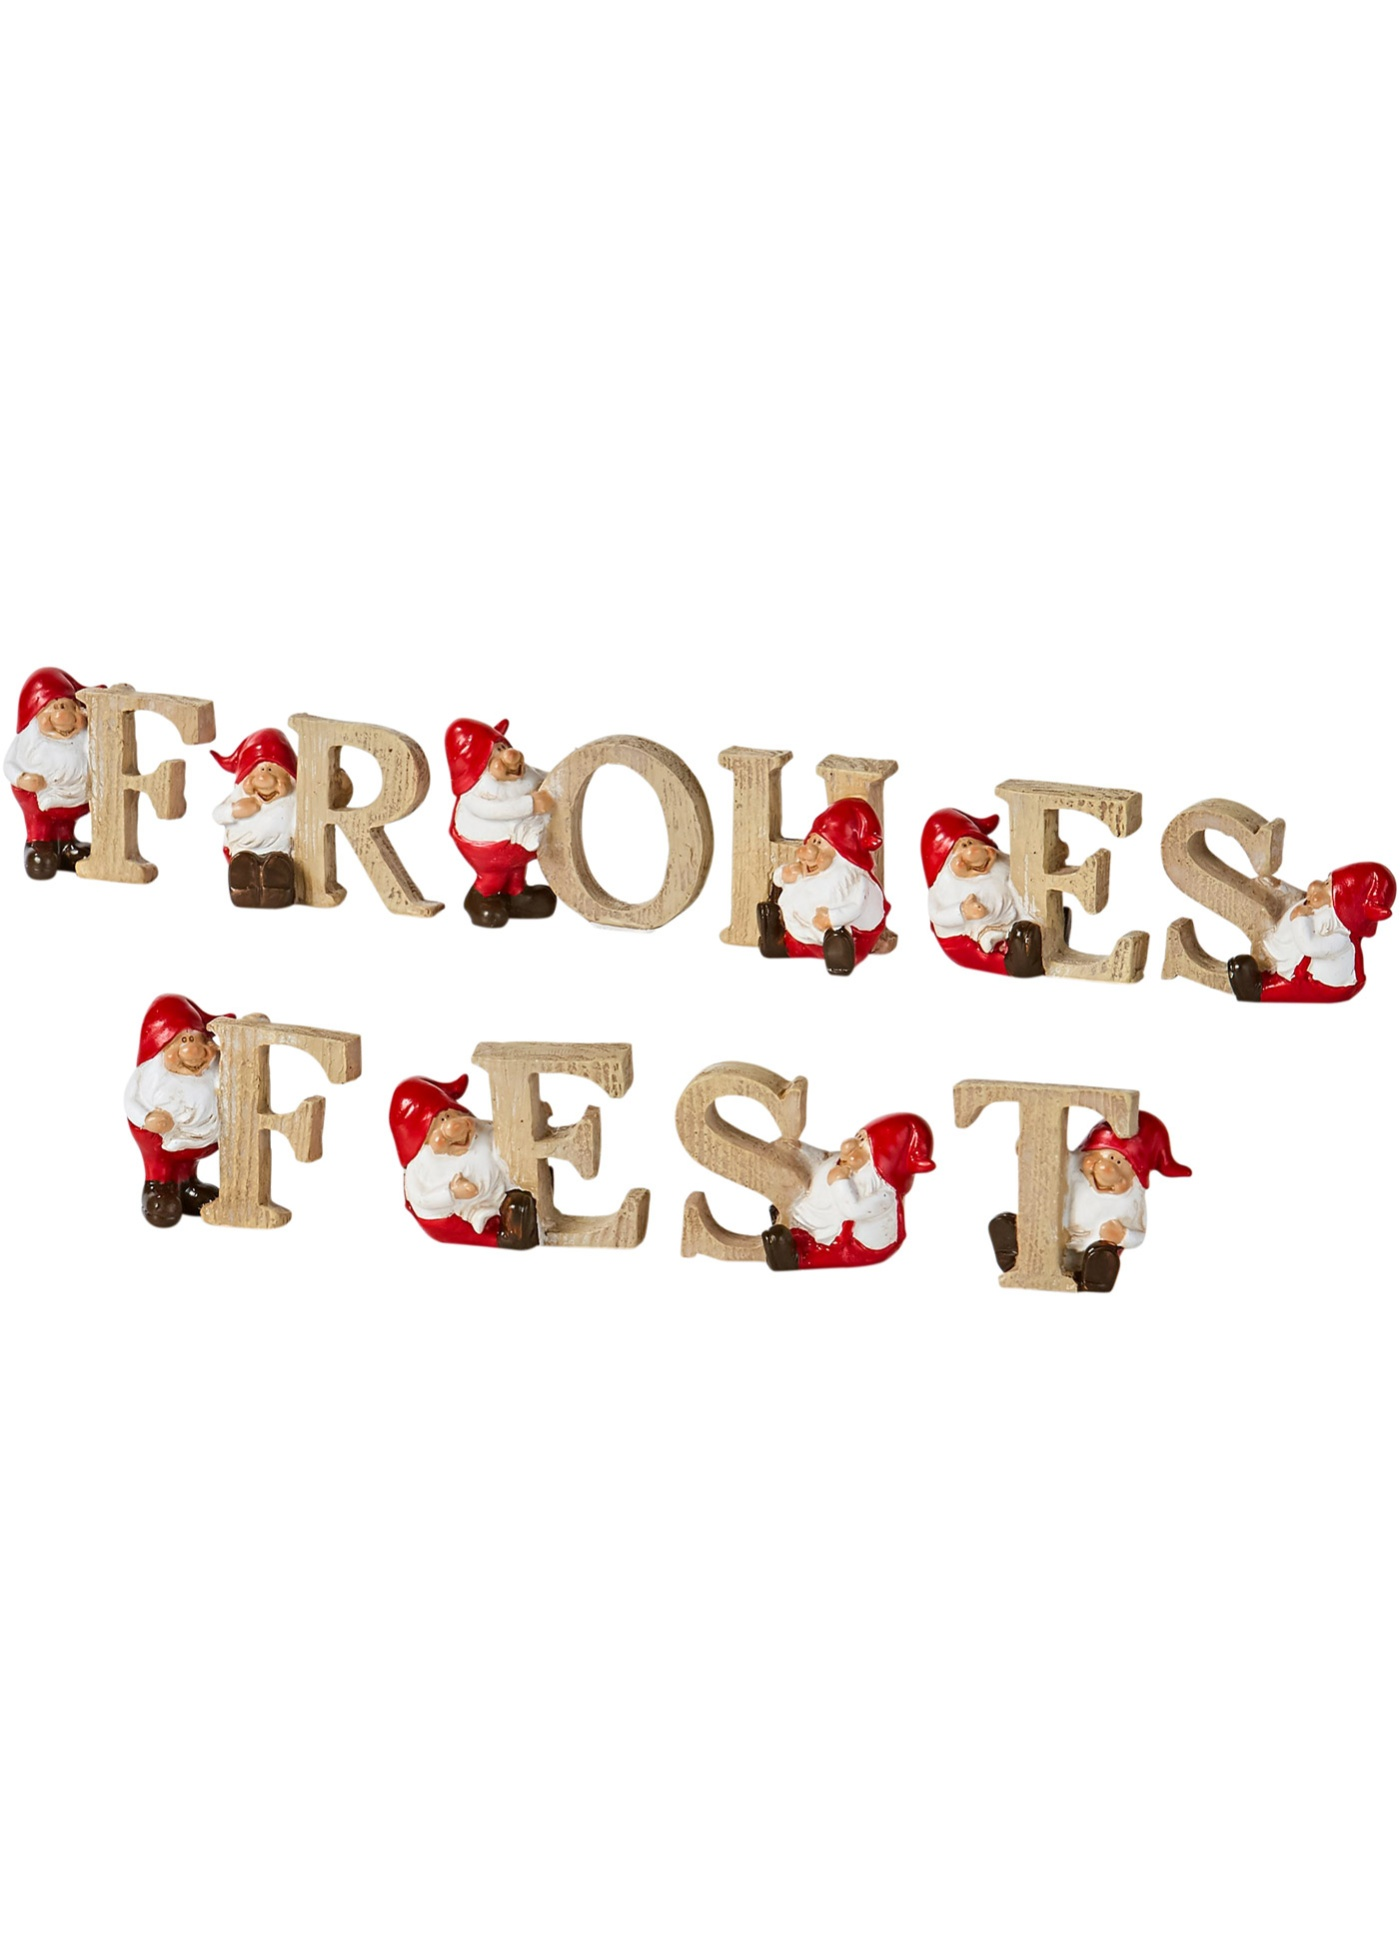 Bonprix - Tomtar Frohes Fest 10 delar 299.00